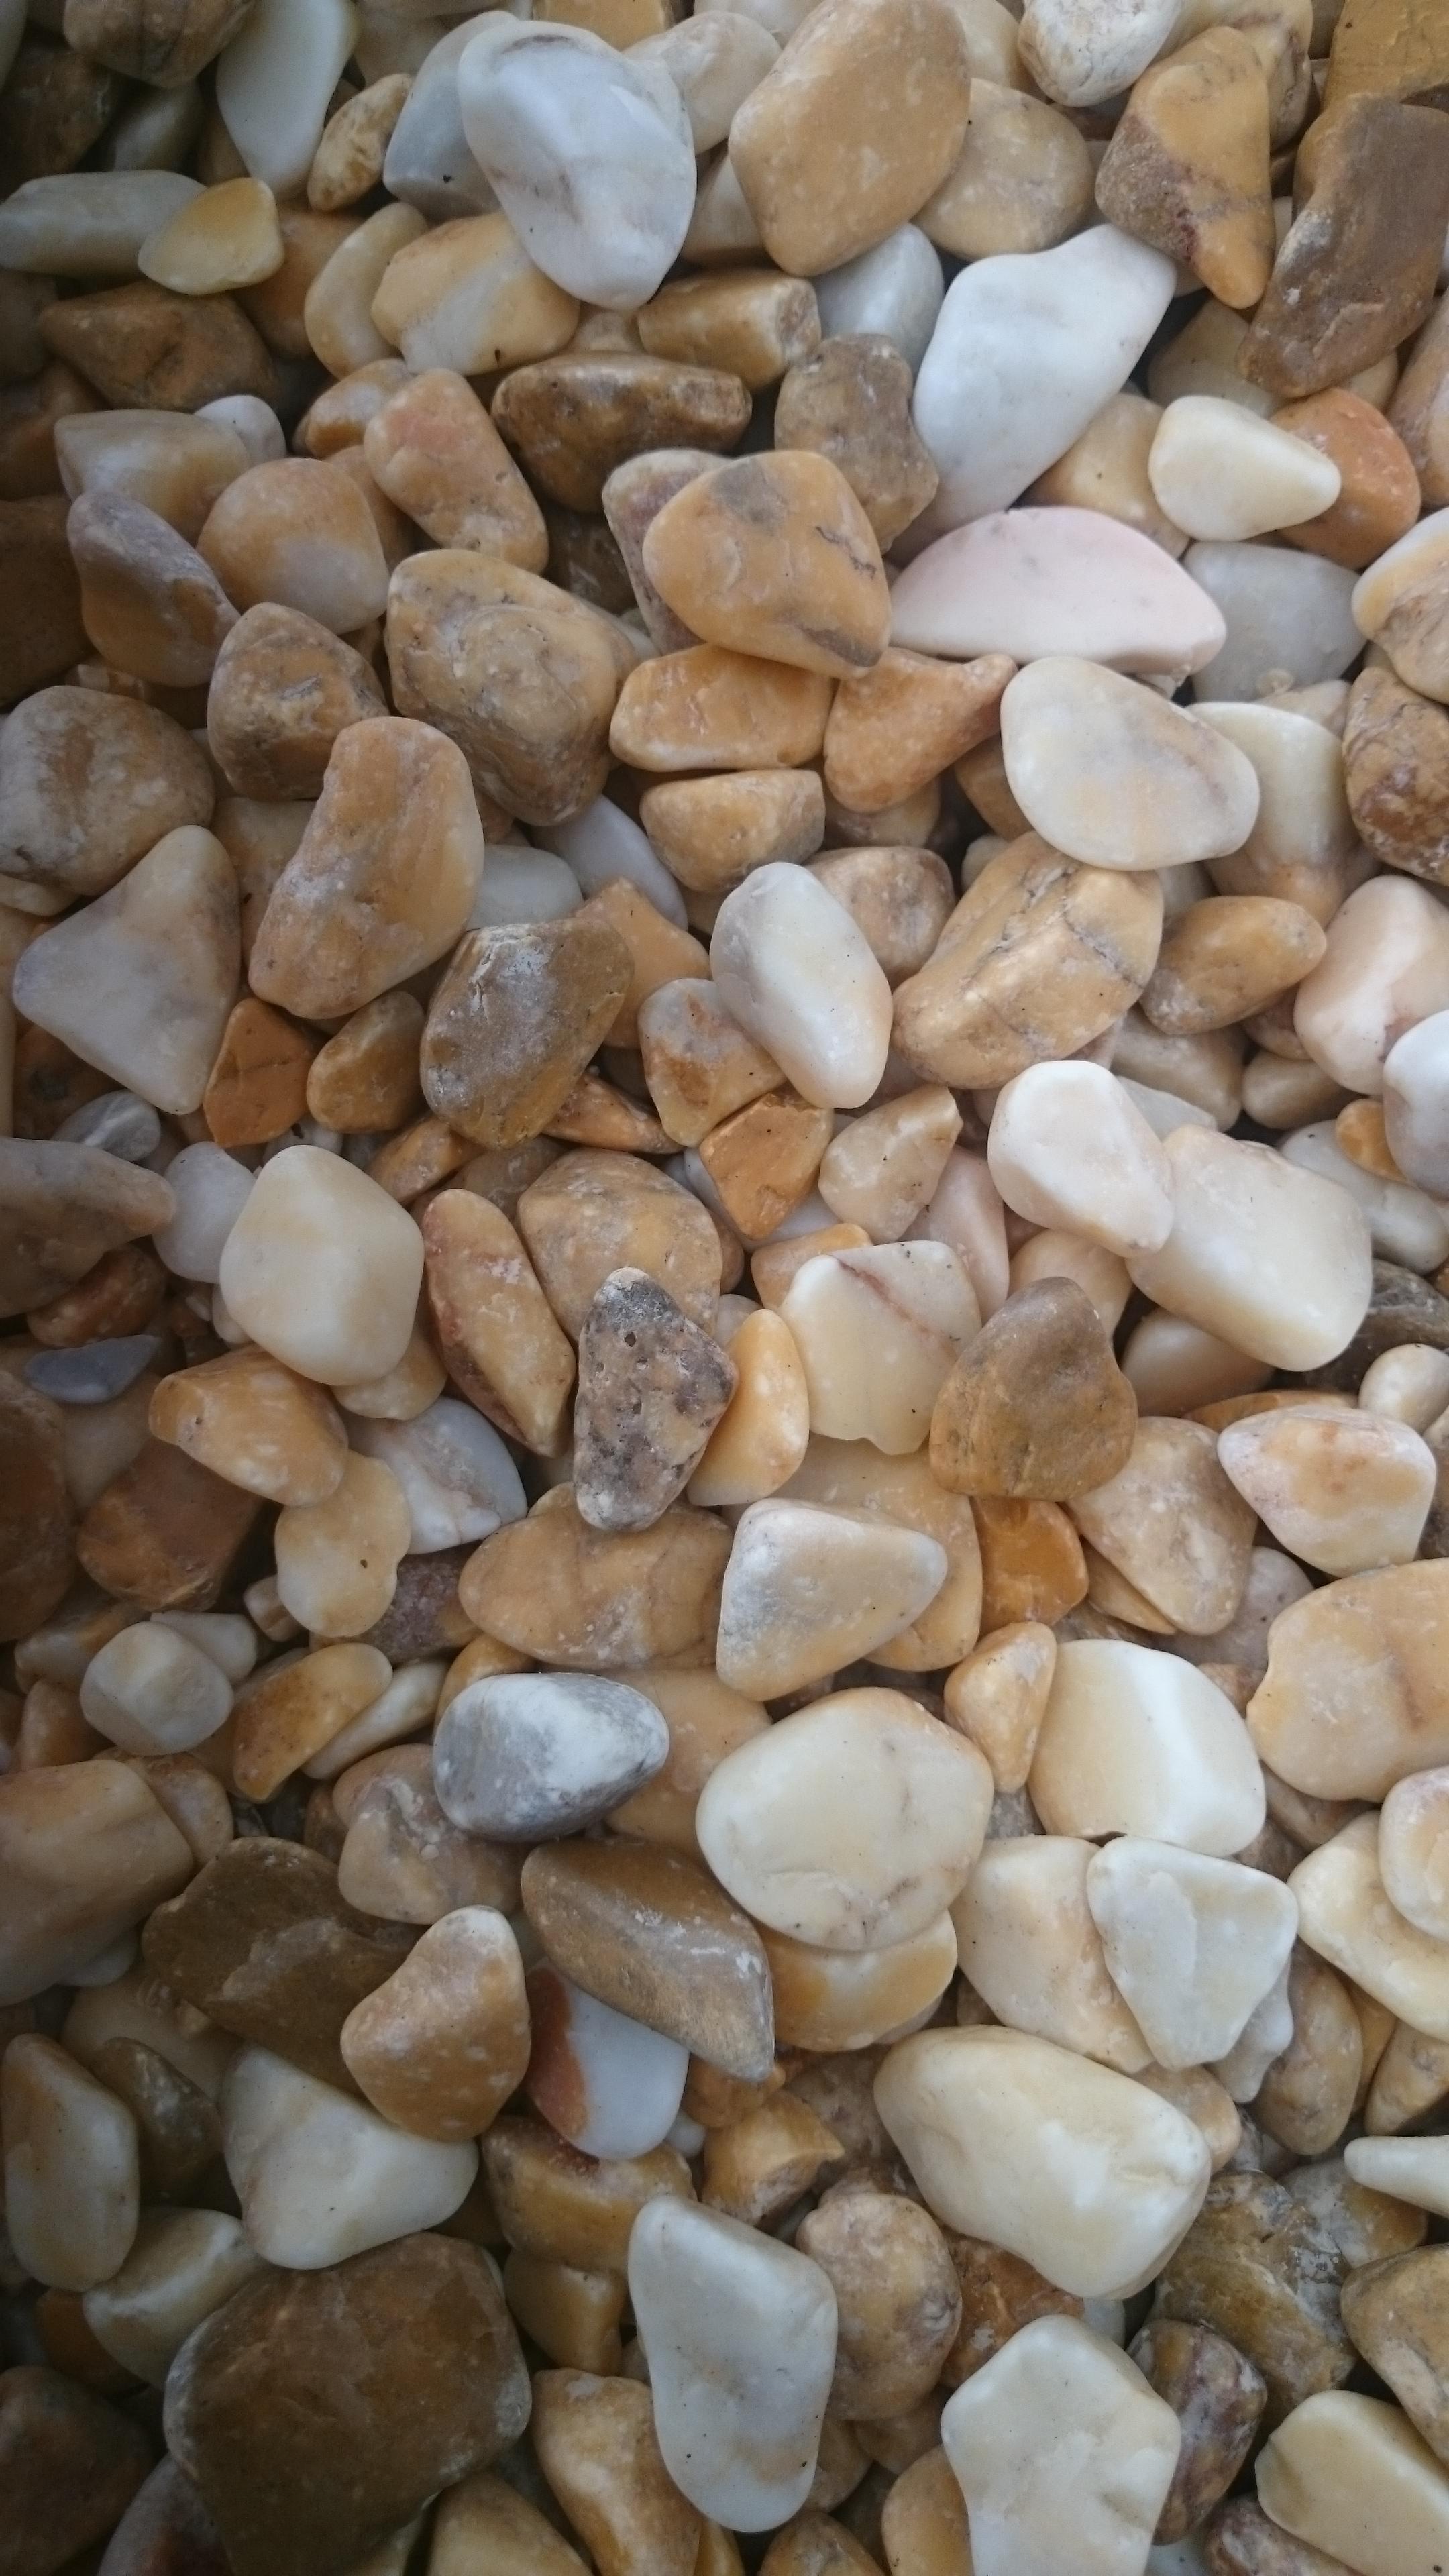 ca94b59d Gul Marmor – Giallo Siena 15/25 mm – 25 kg